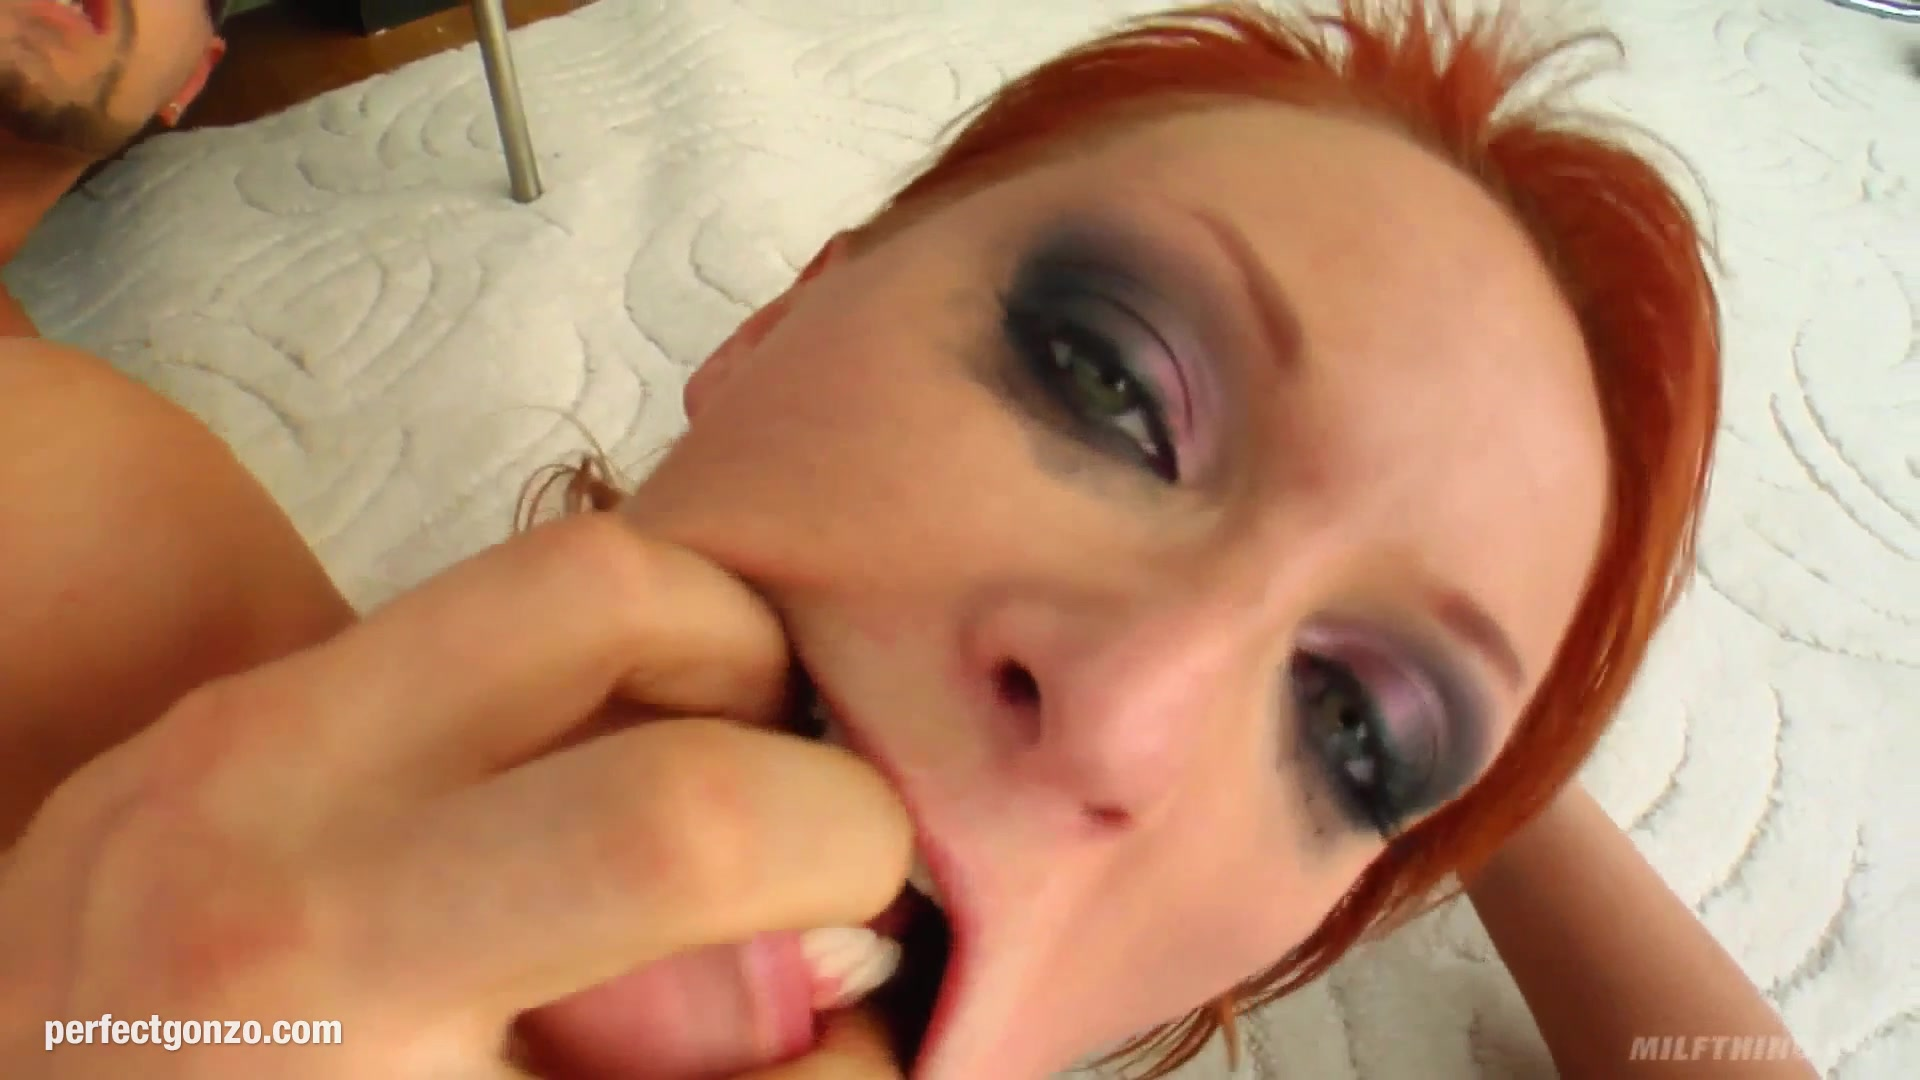 Milf Thing delivers Leonie mature milf gonzo porn scene